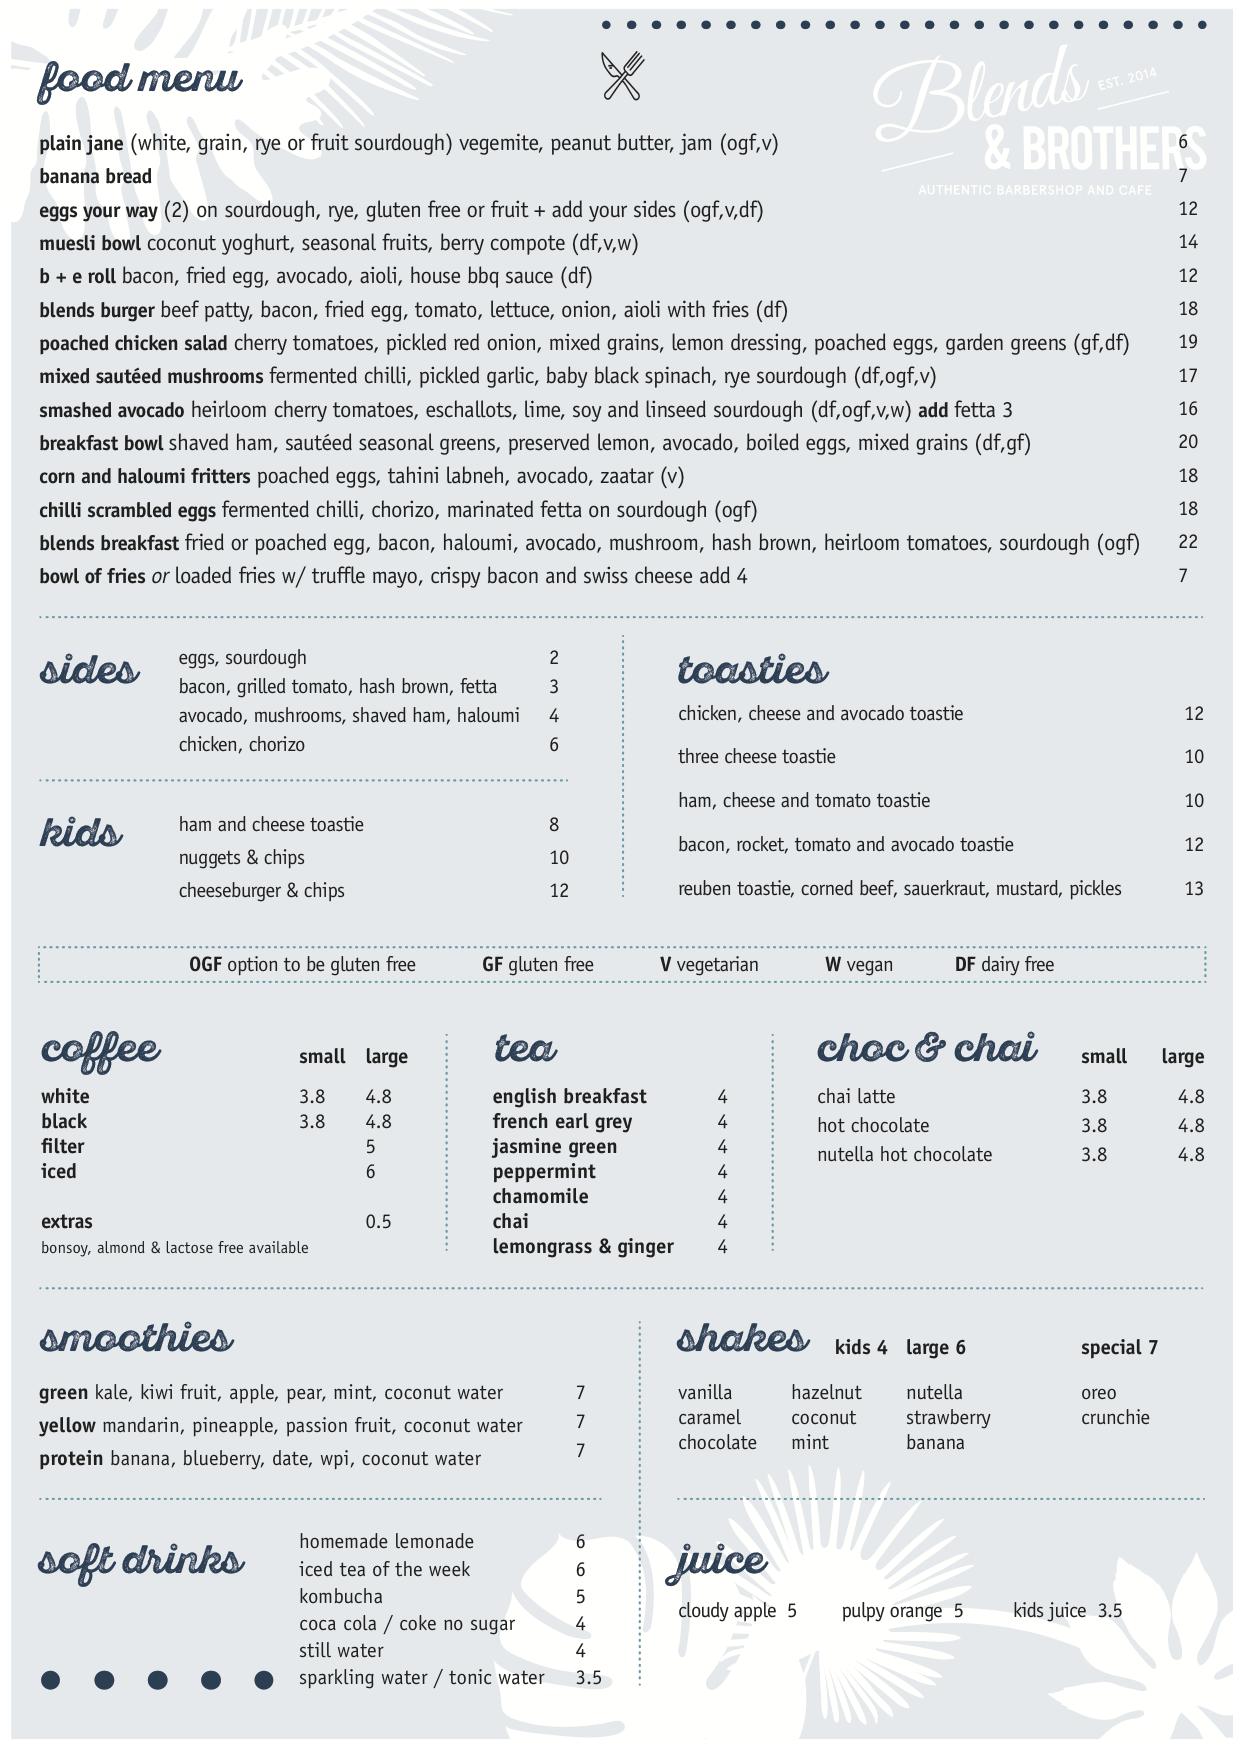 blends menu 17 April 2018 Flower Final 2.png